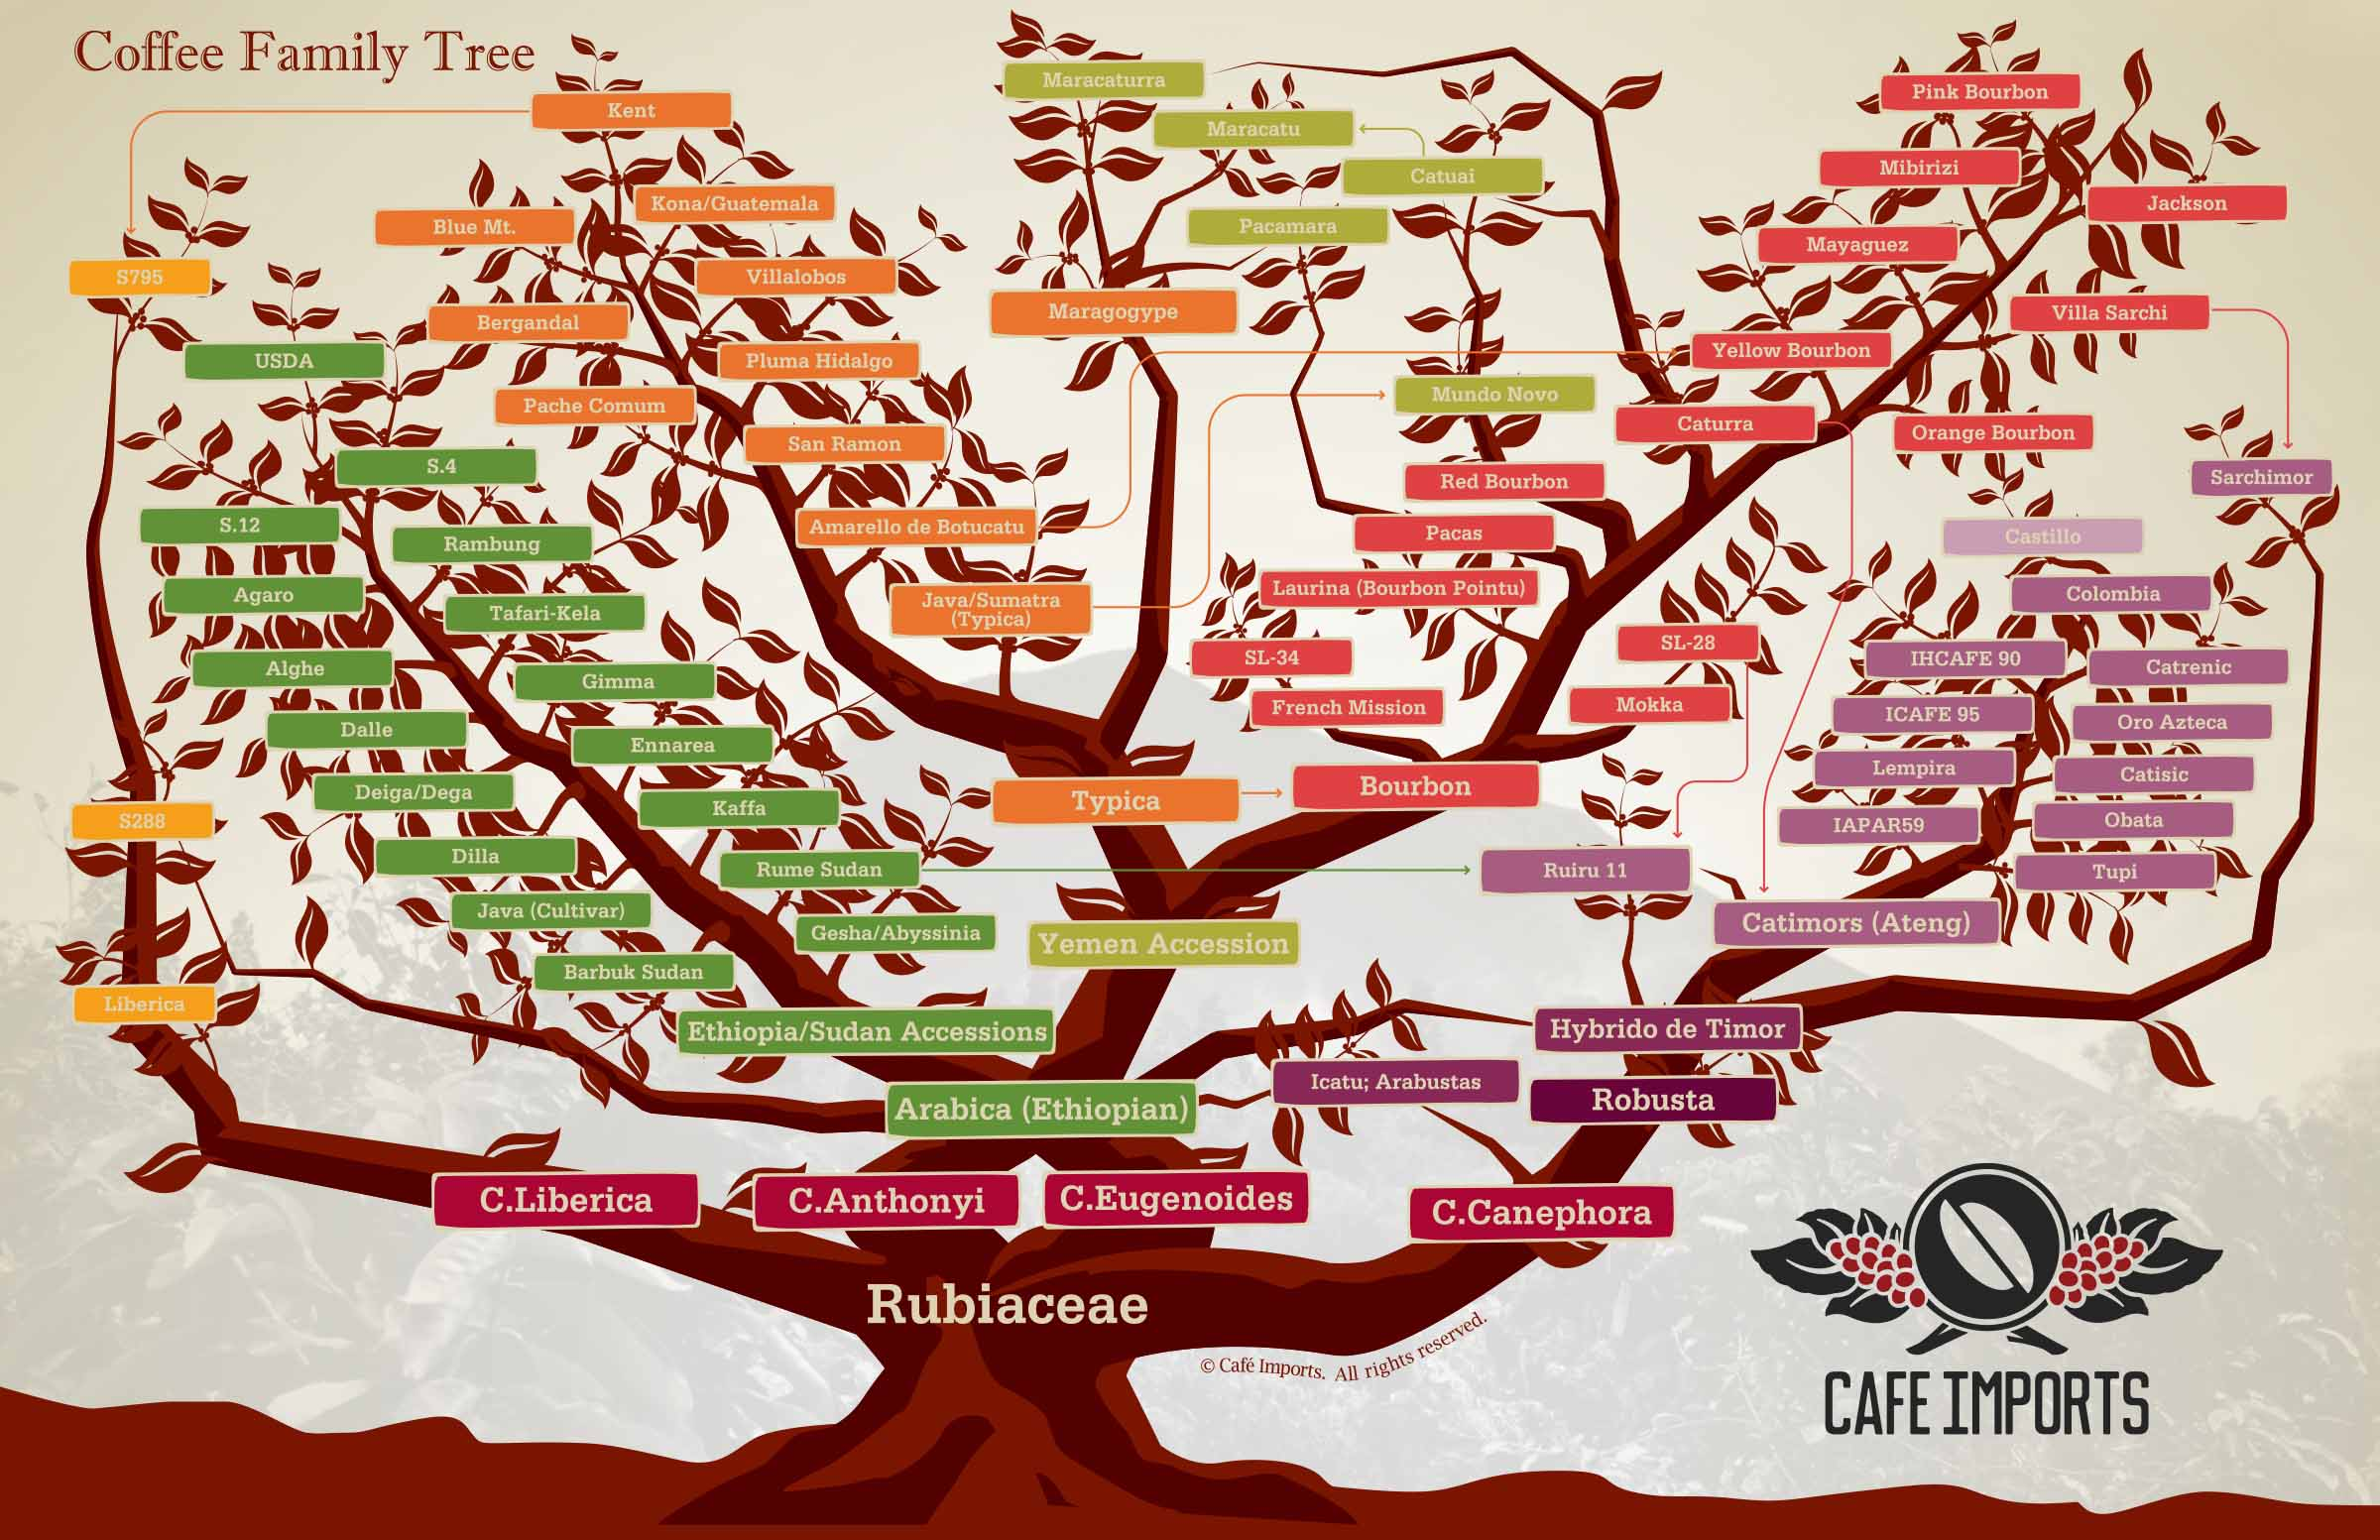 Coffee_Family_Tree_2015